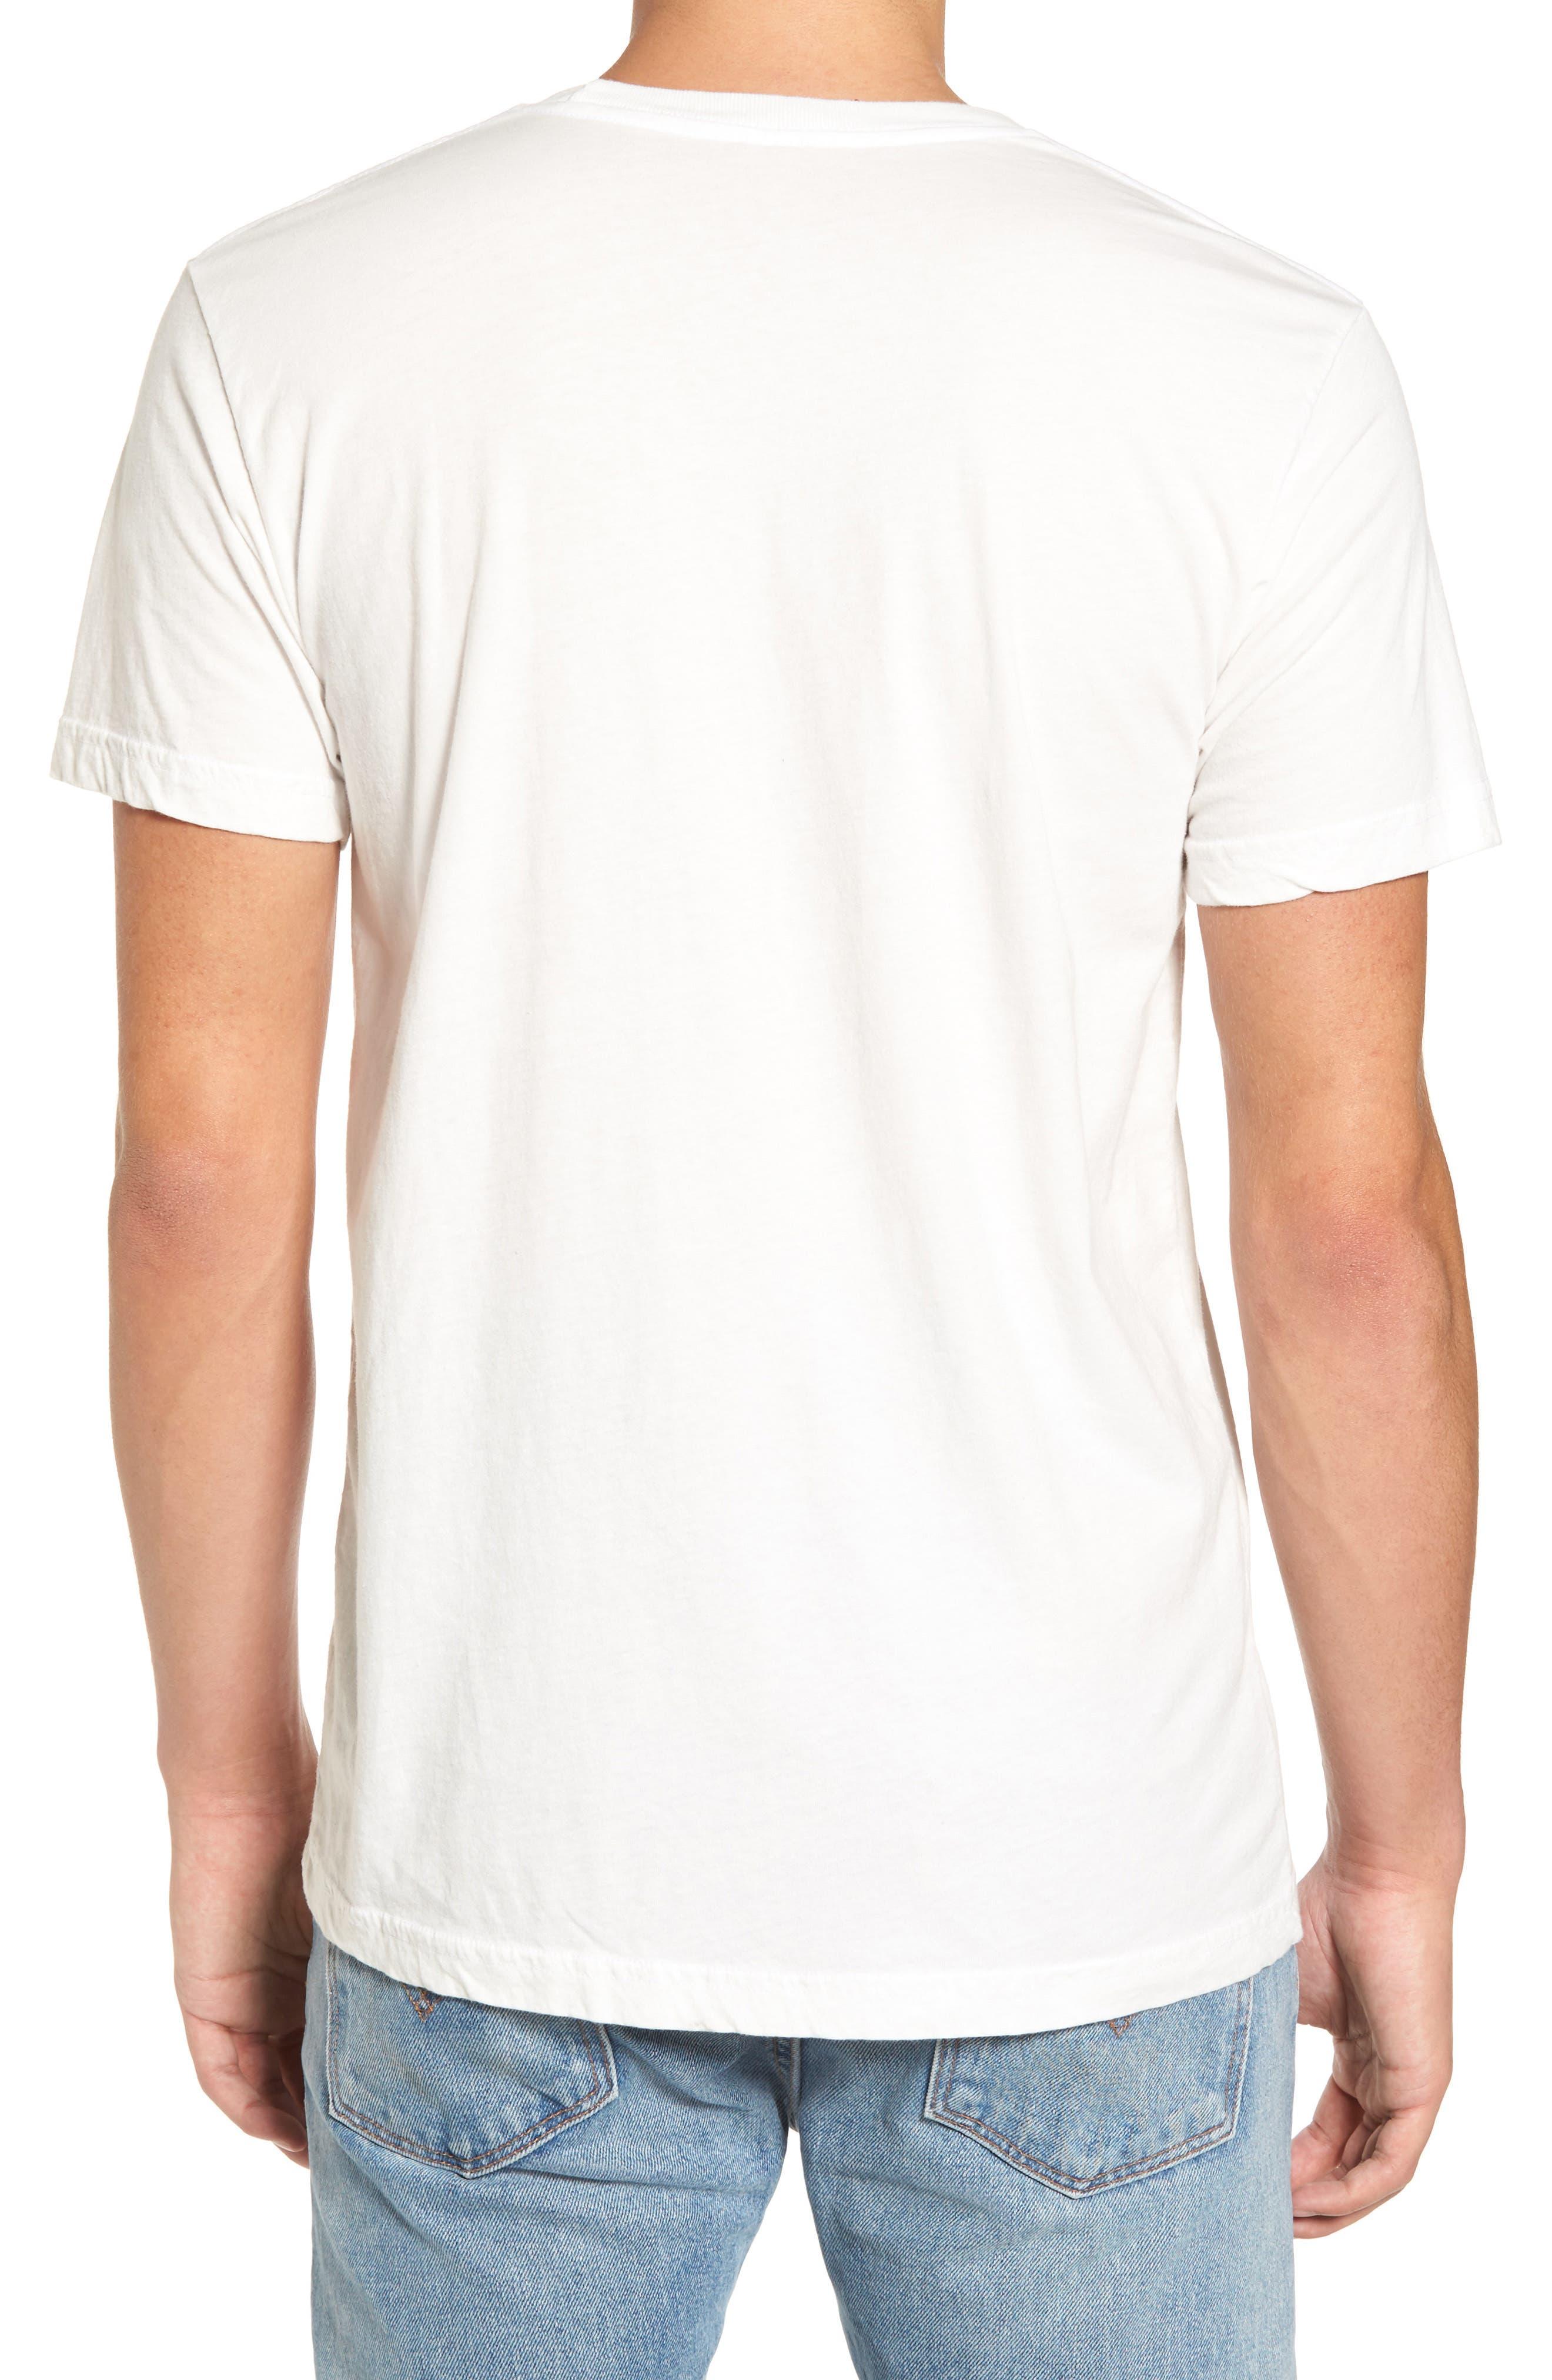 Kate Embroidered T-Shirt,                             Alternate thumbnail 2, color,                             White